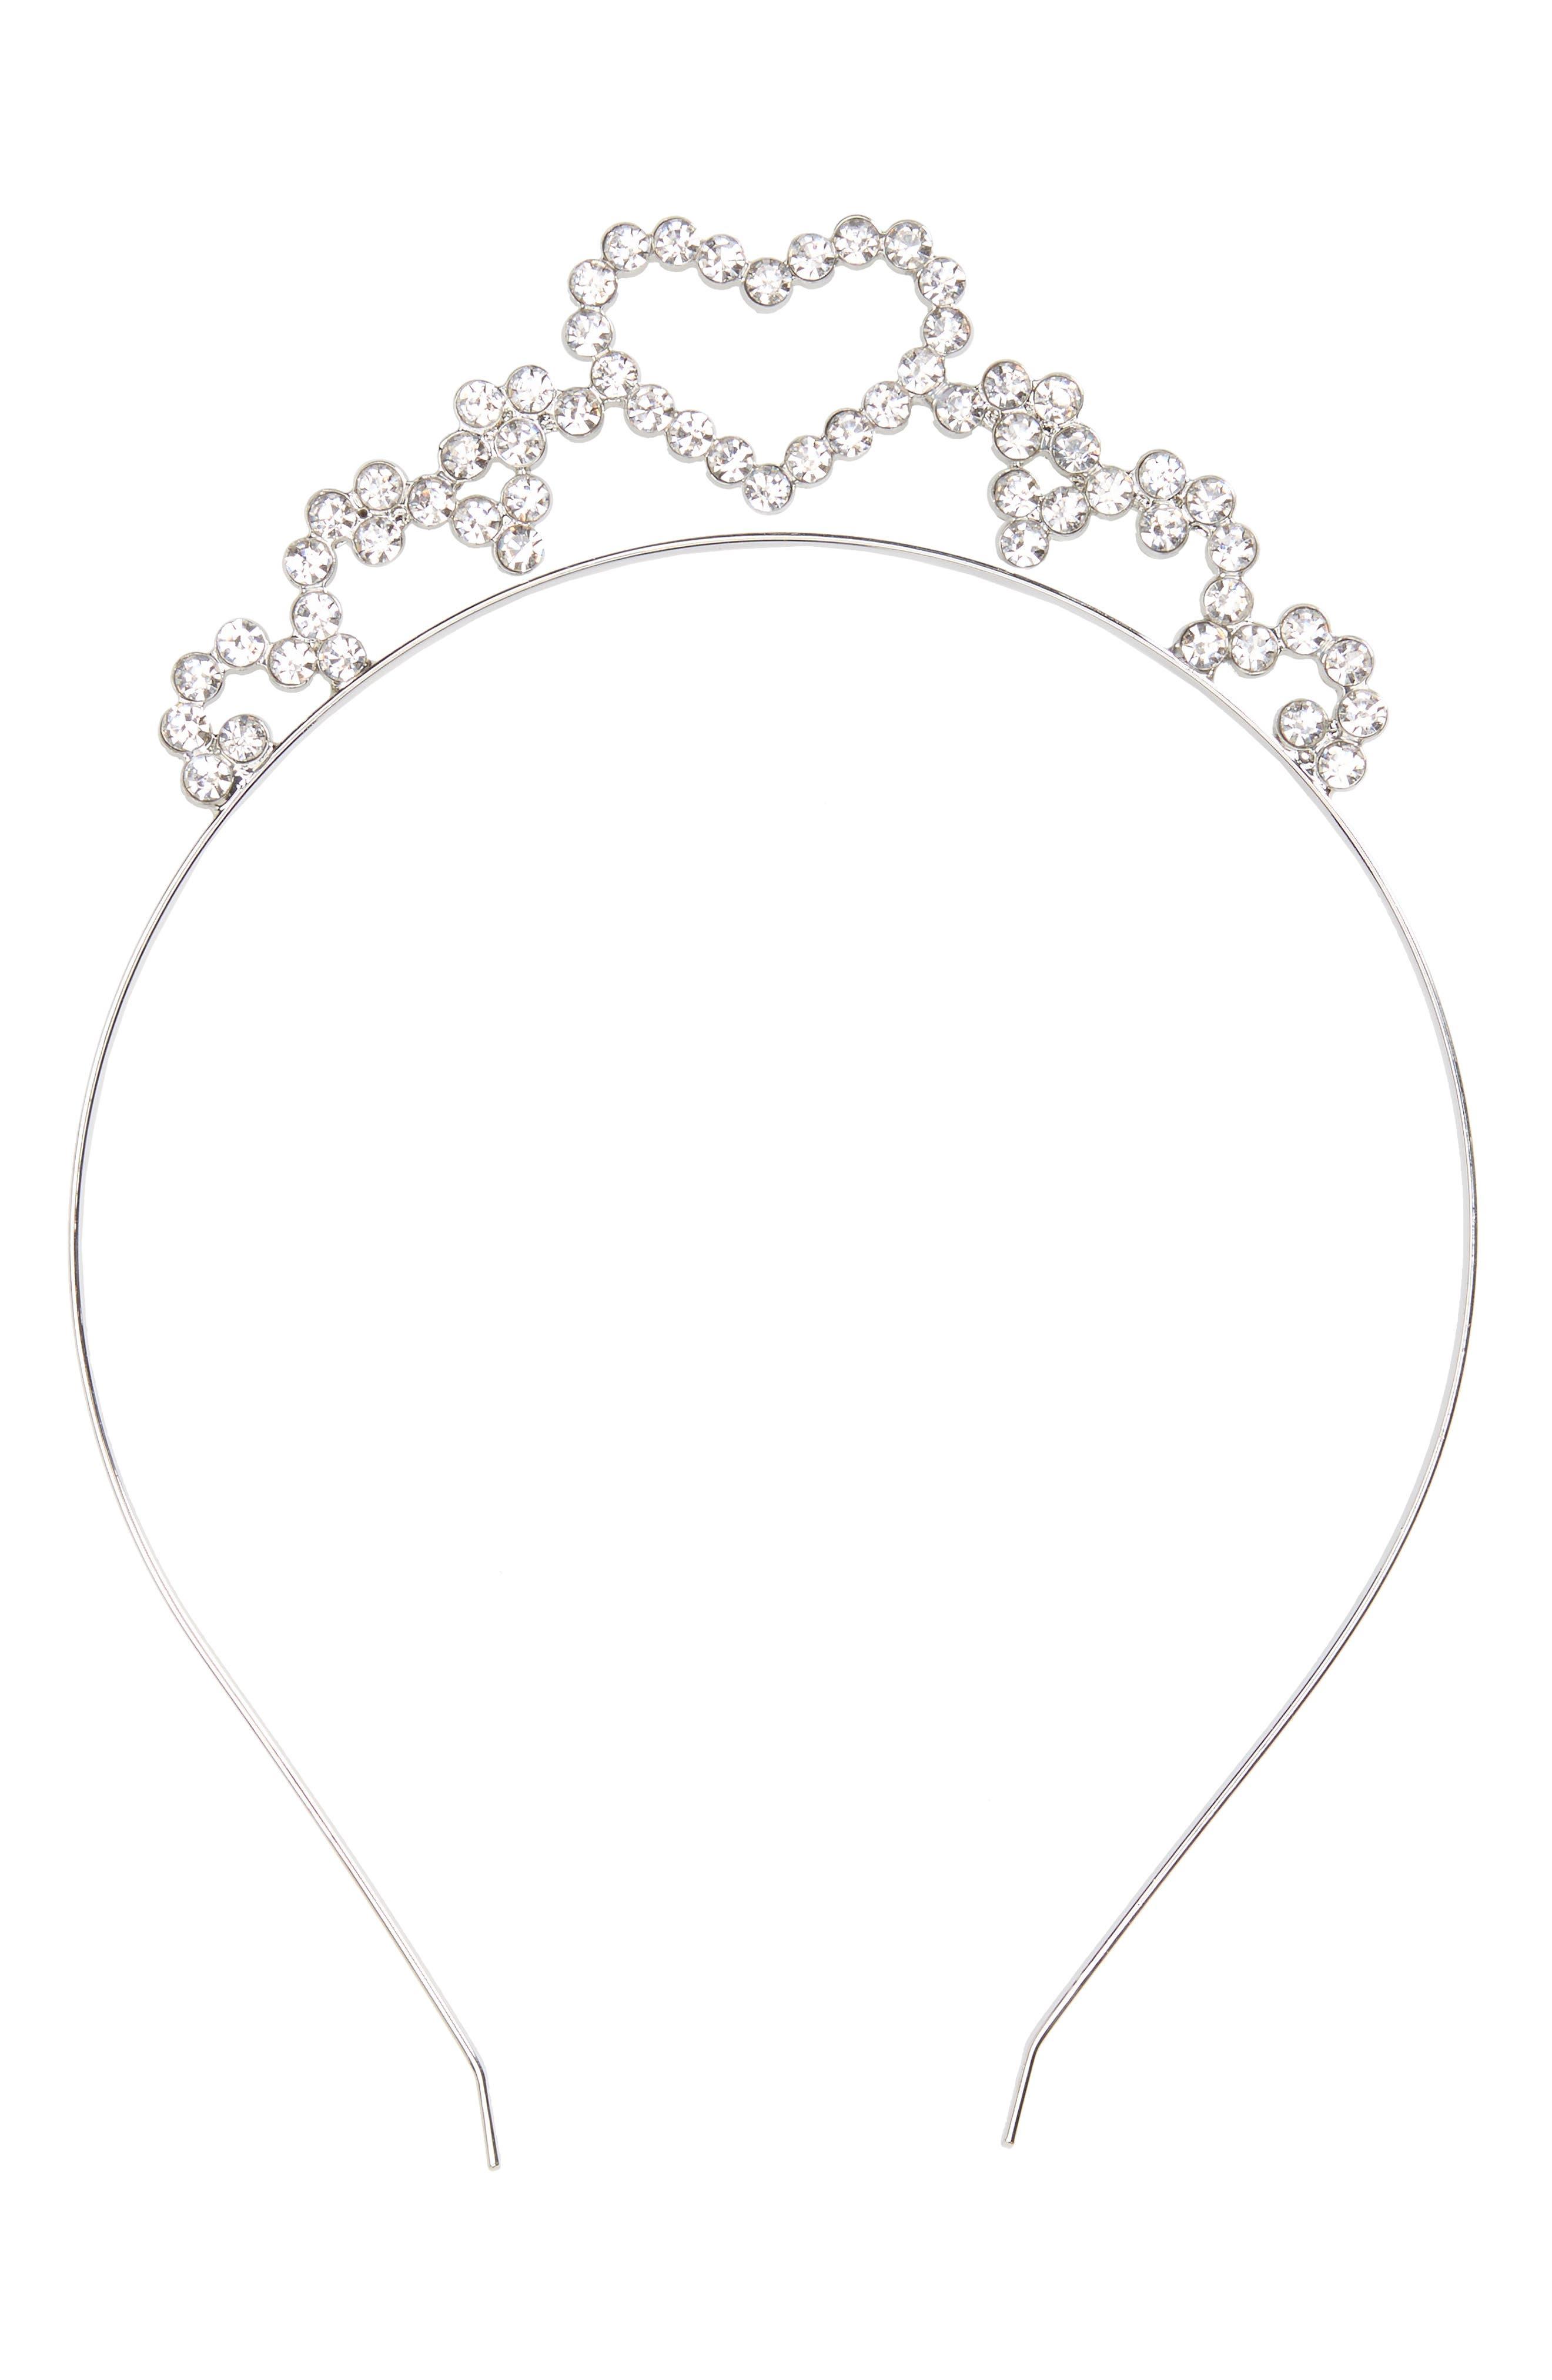 Accessory Collective Crystal Heart Headband,                             Main thumbnail 1, color,                             044